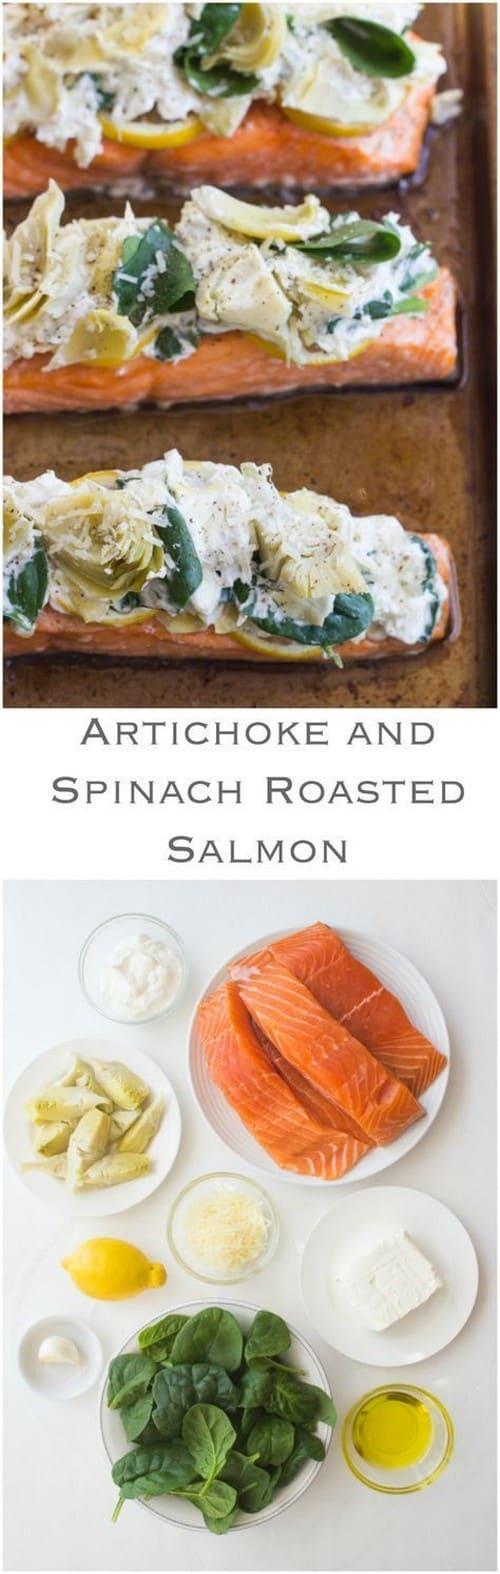 Mediterranean Artichoke and Spinach Roasted Salmon